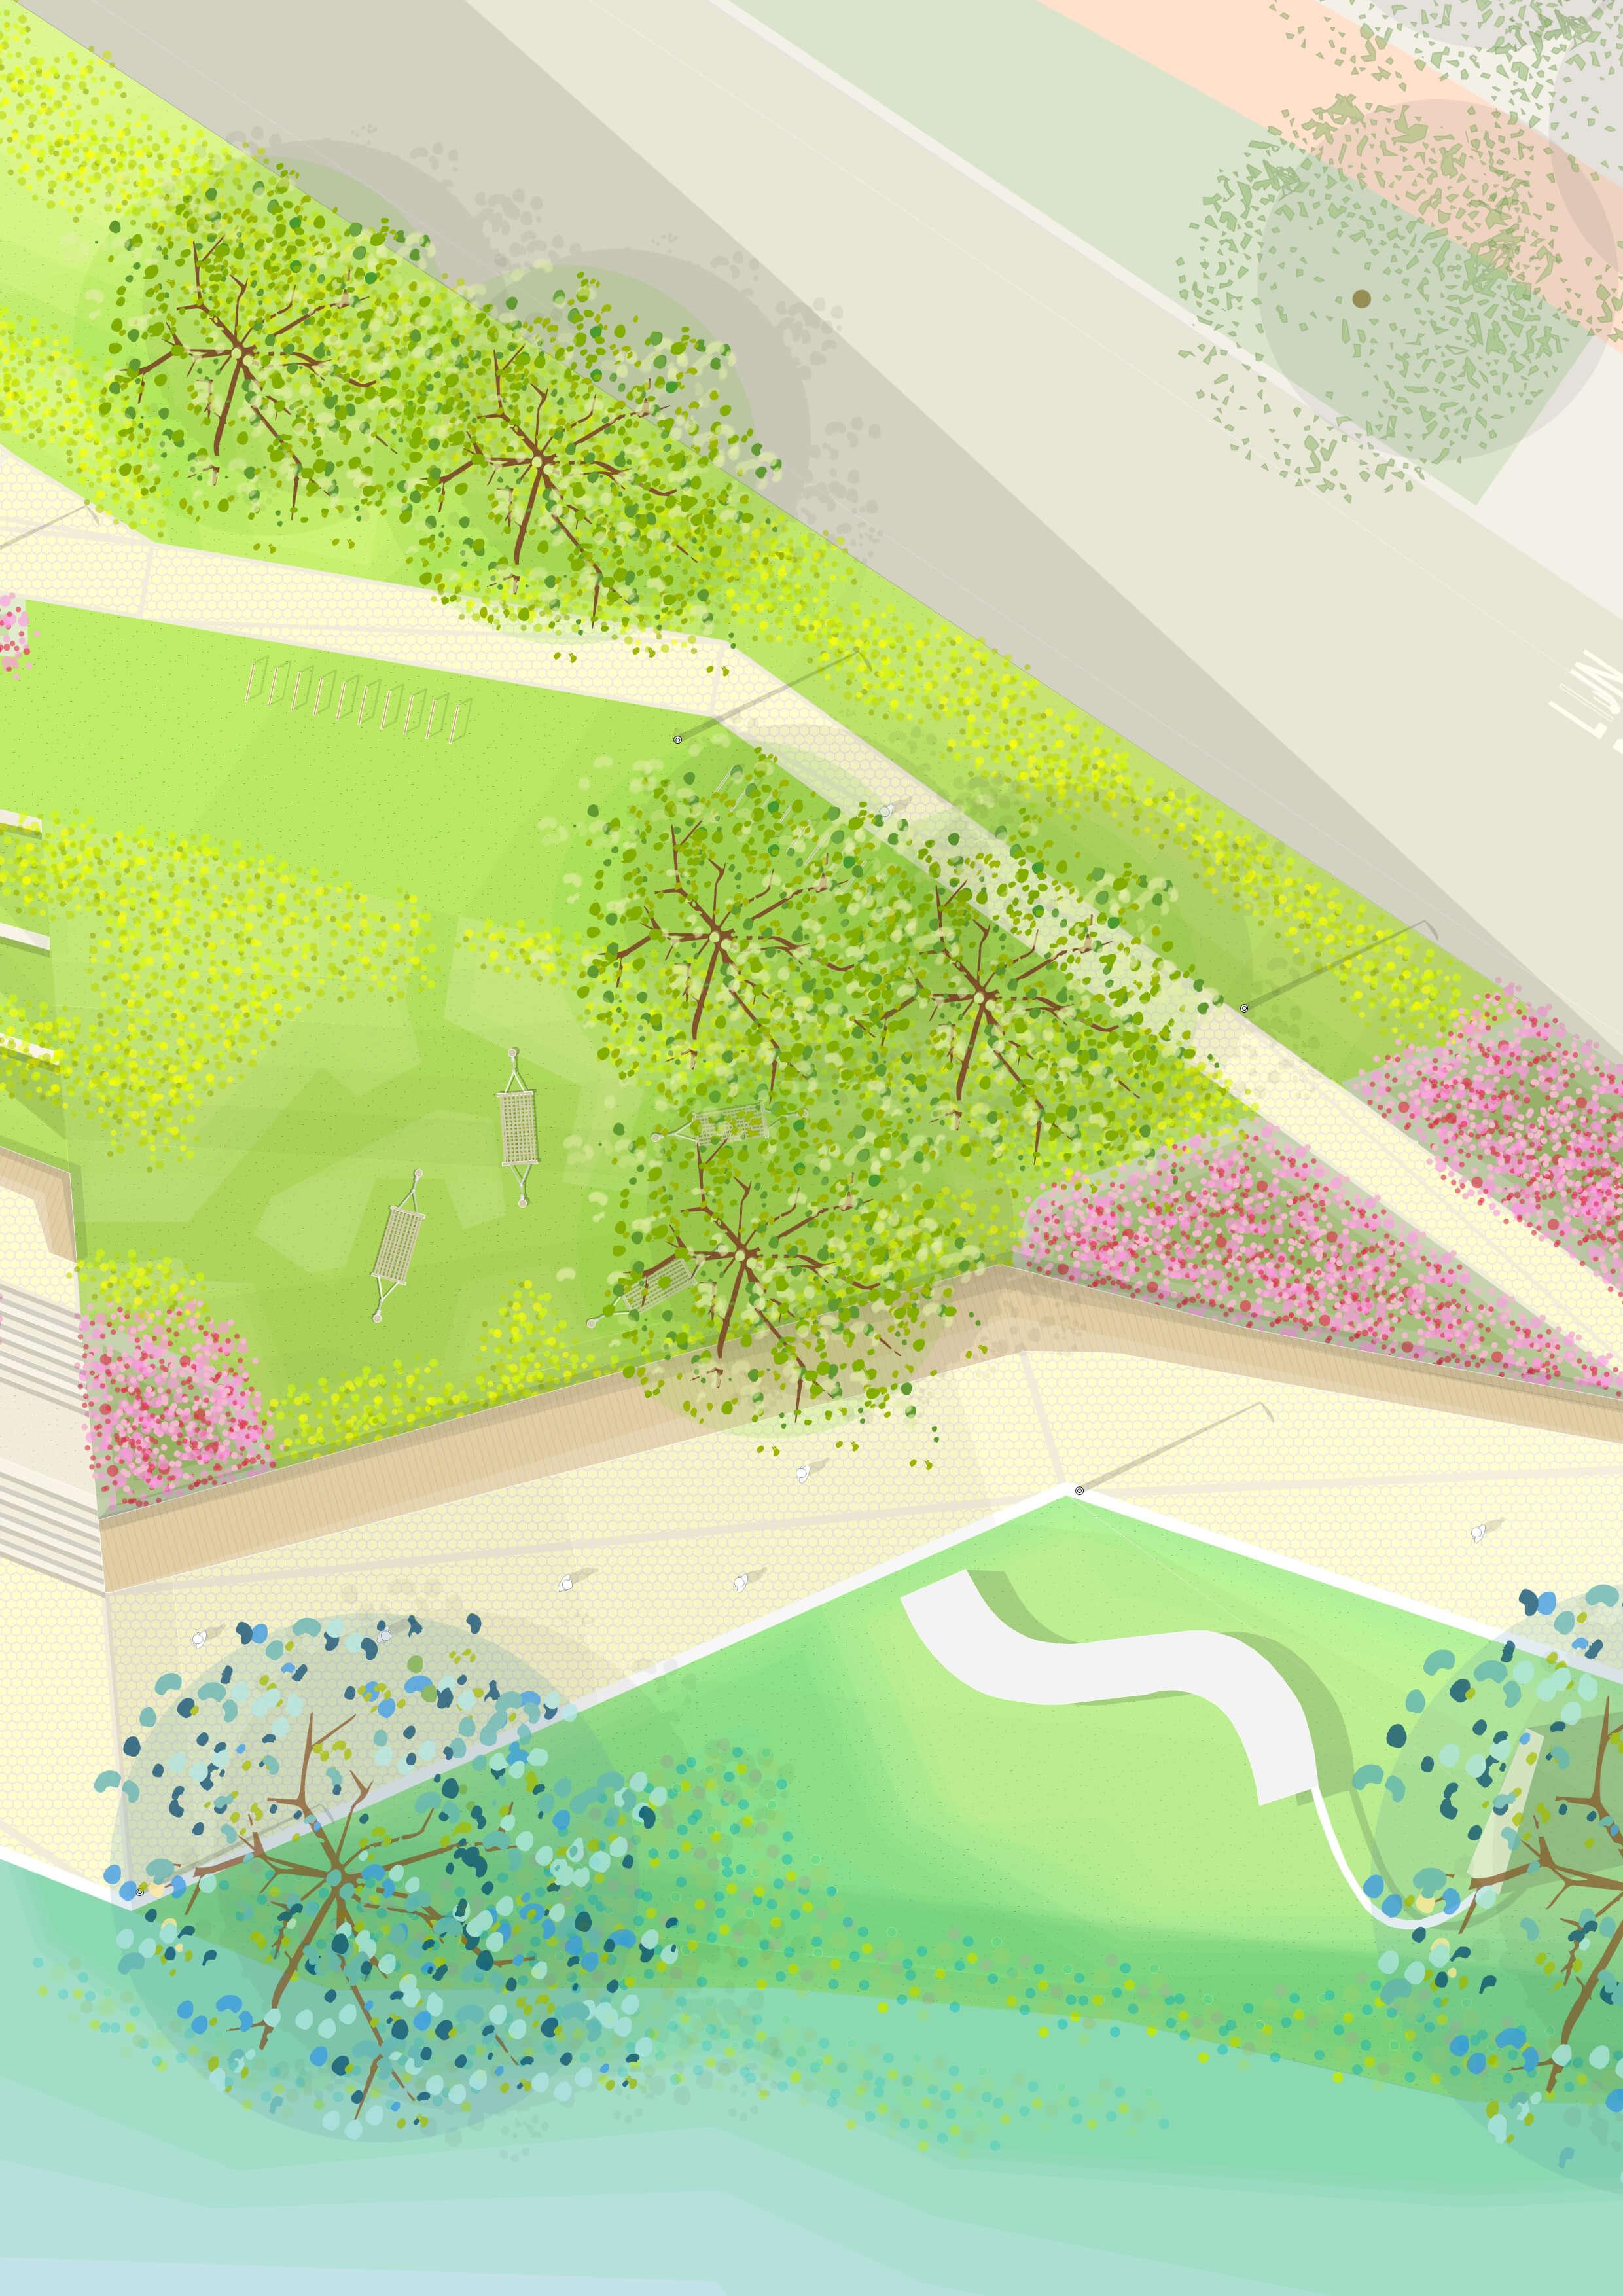 felixx-smakkelaarsveld-planzoompark.jpg